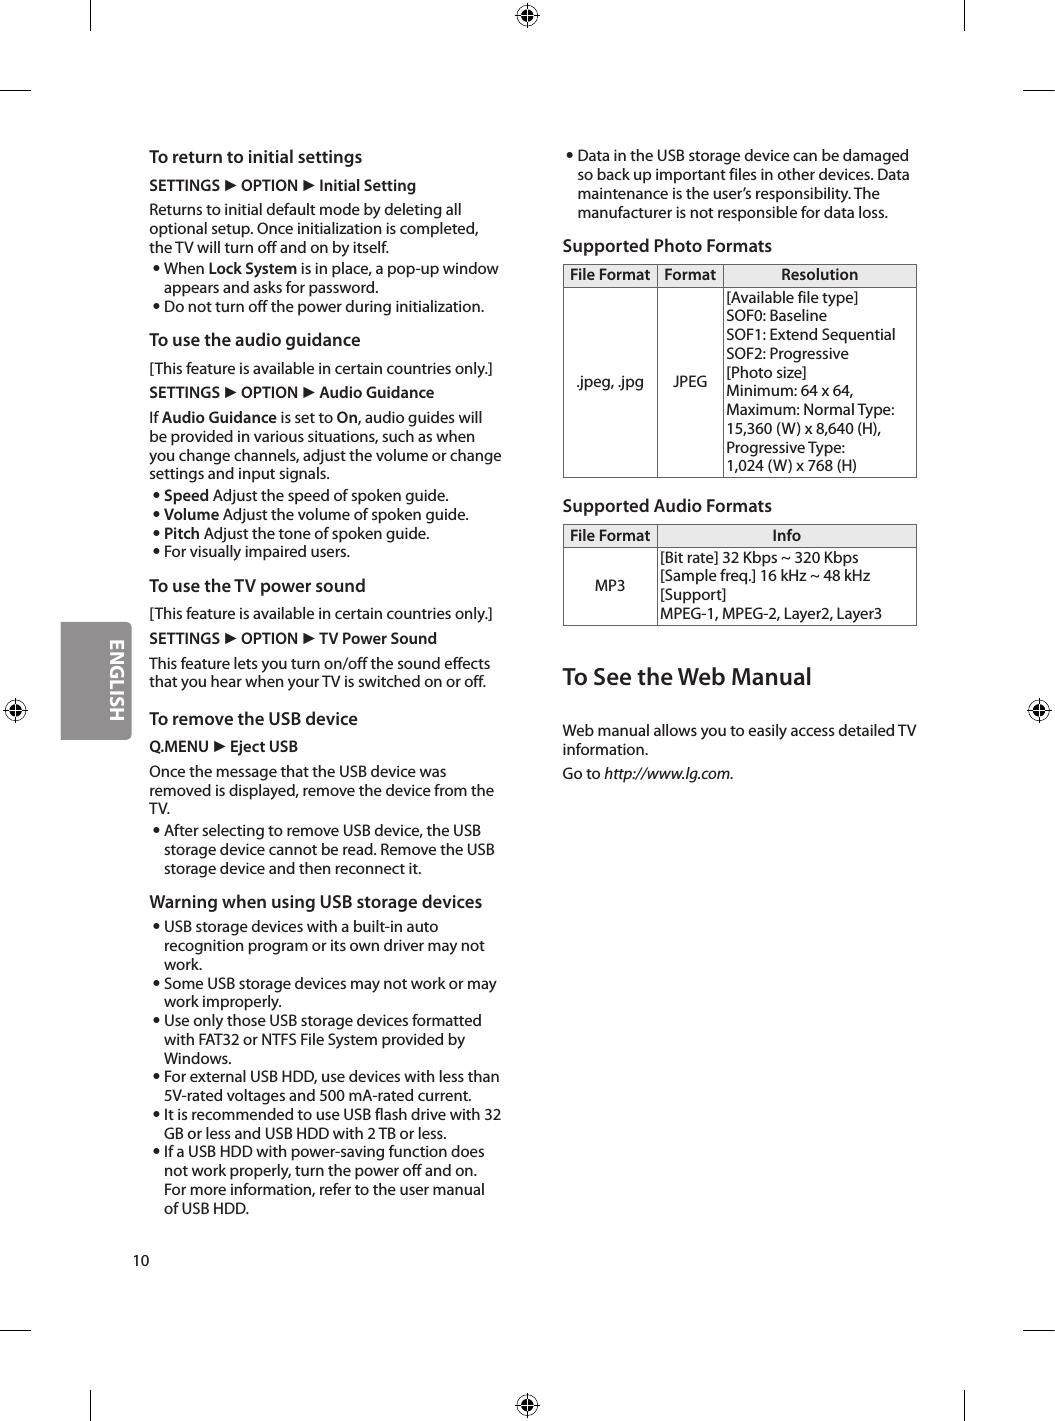 LG 49LJ510M User Manual Owner's MFL69728347 1 2 MFL69670644